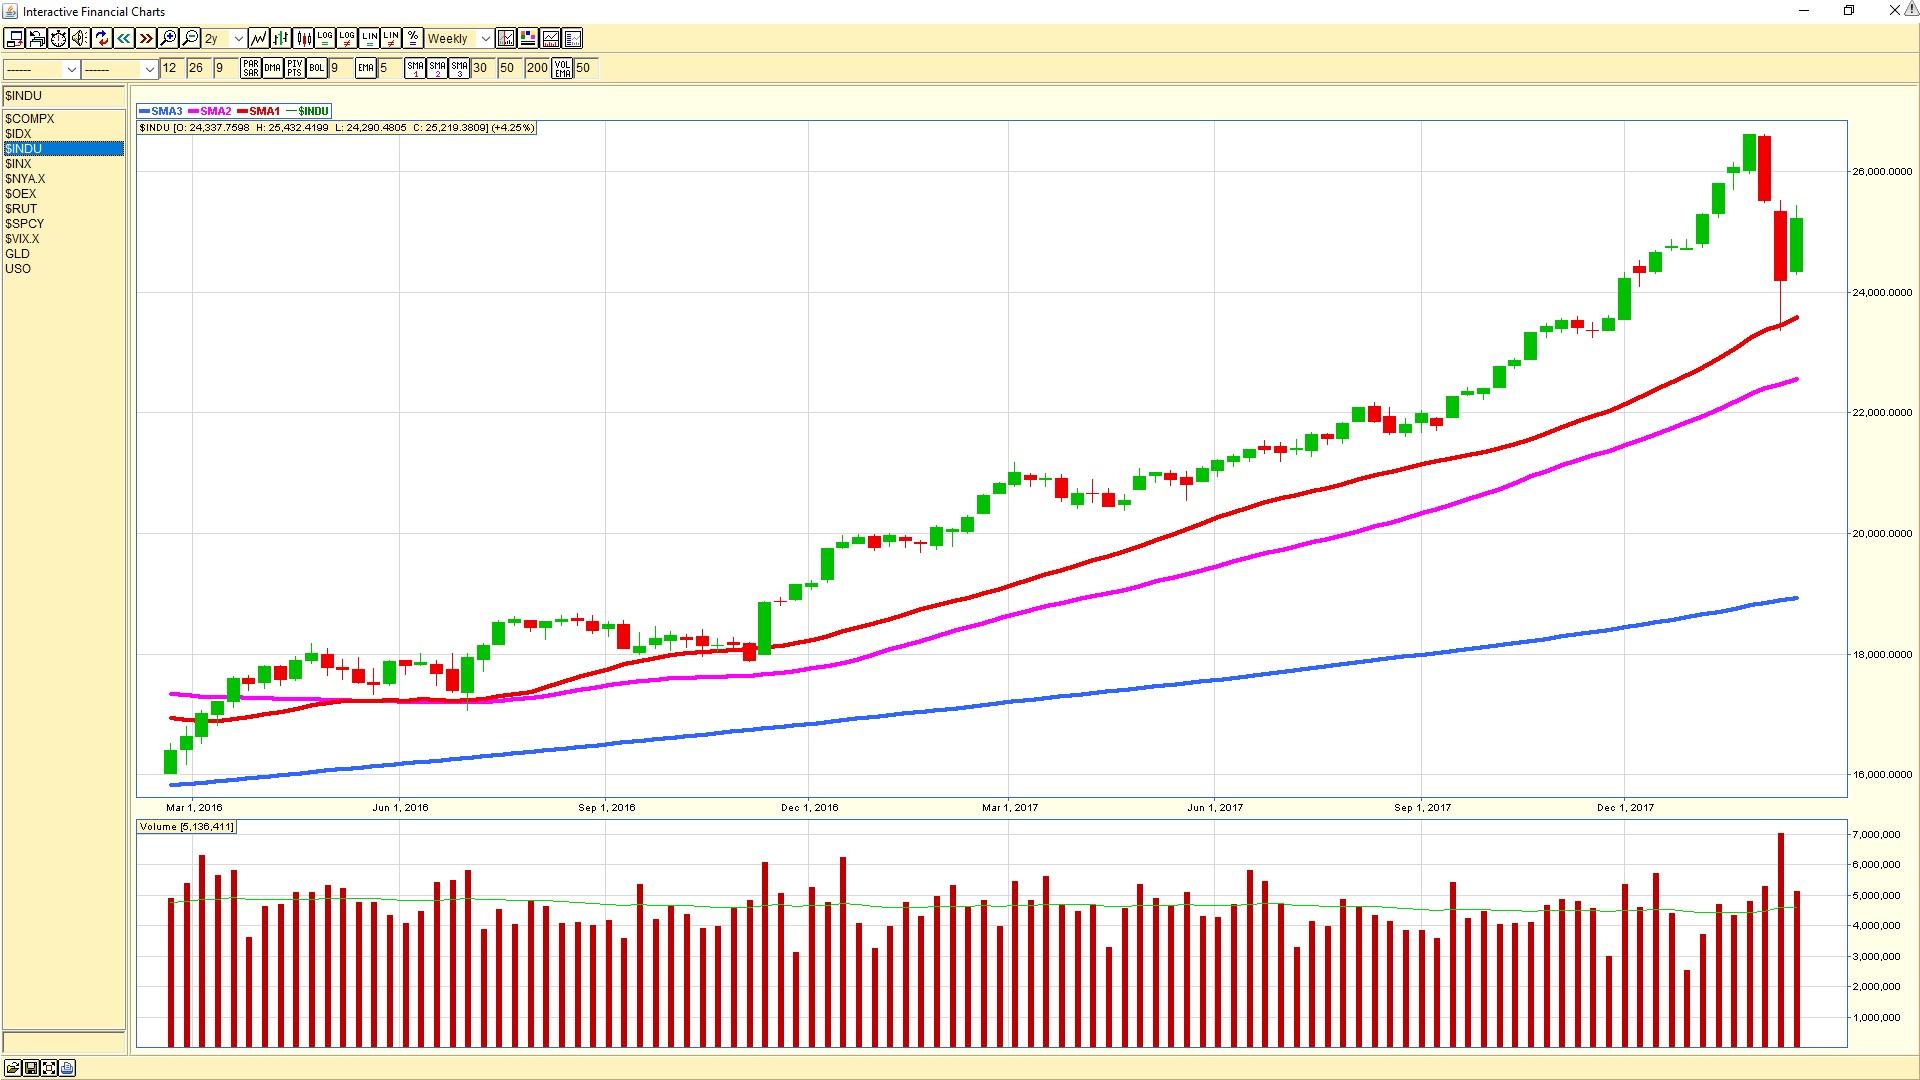 Dow Jones Industrial Average weekly chart